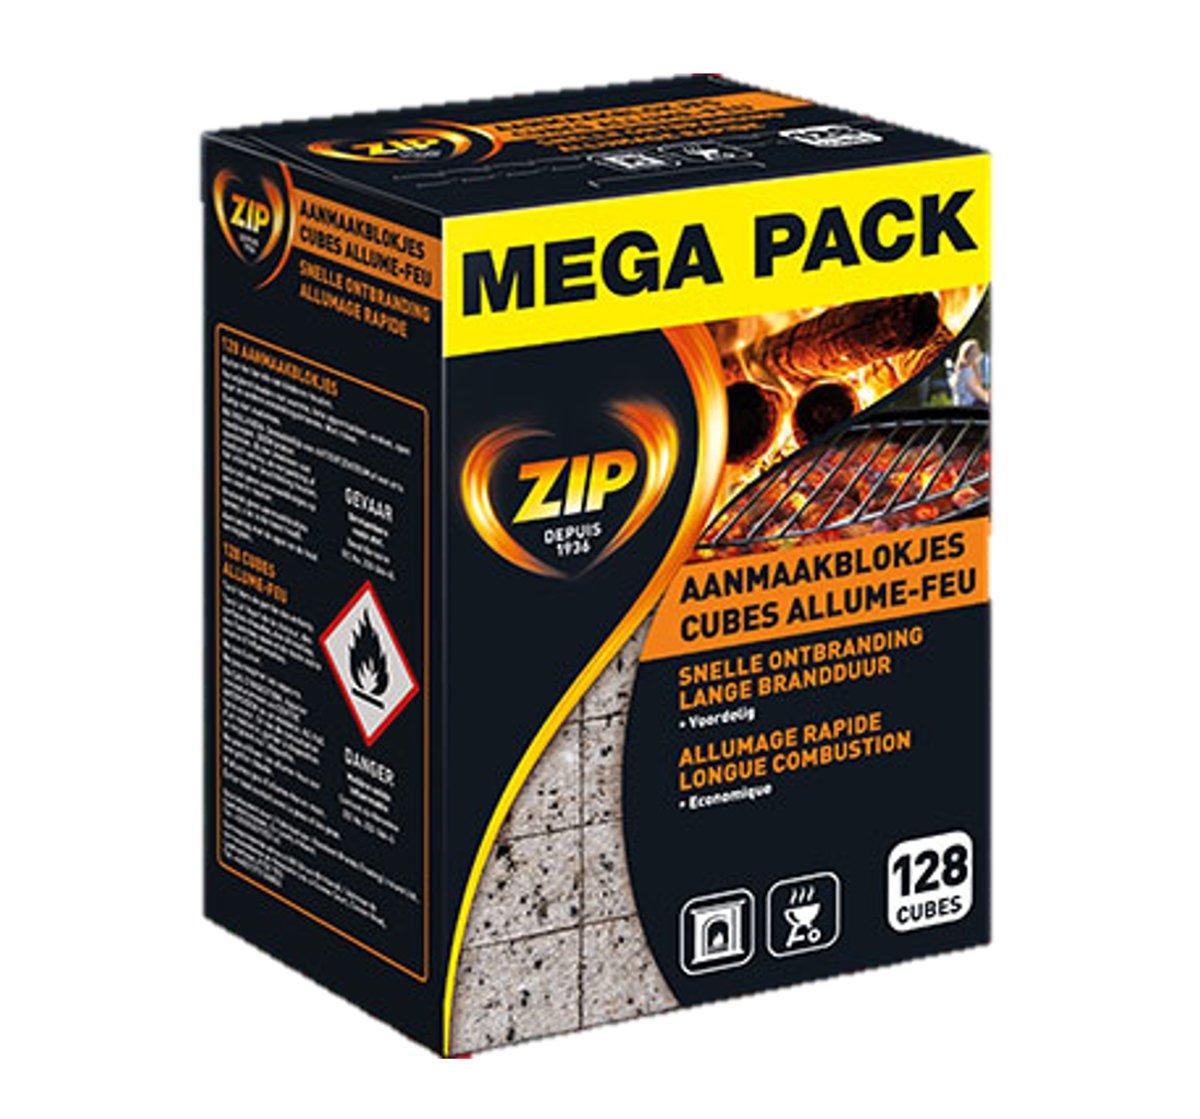 ZIP - Aanmaakblokjes - mega pack - 128 blokjes kopen